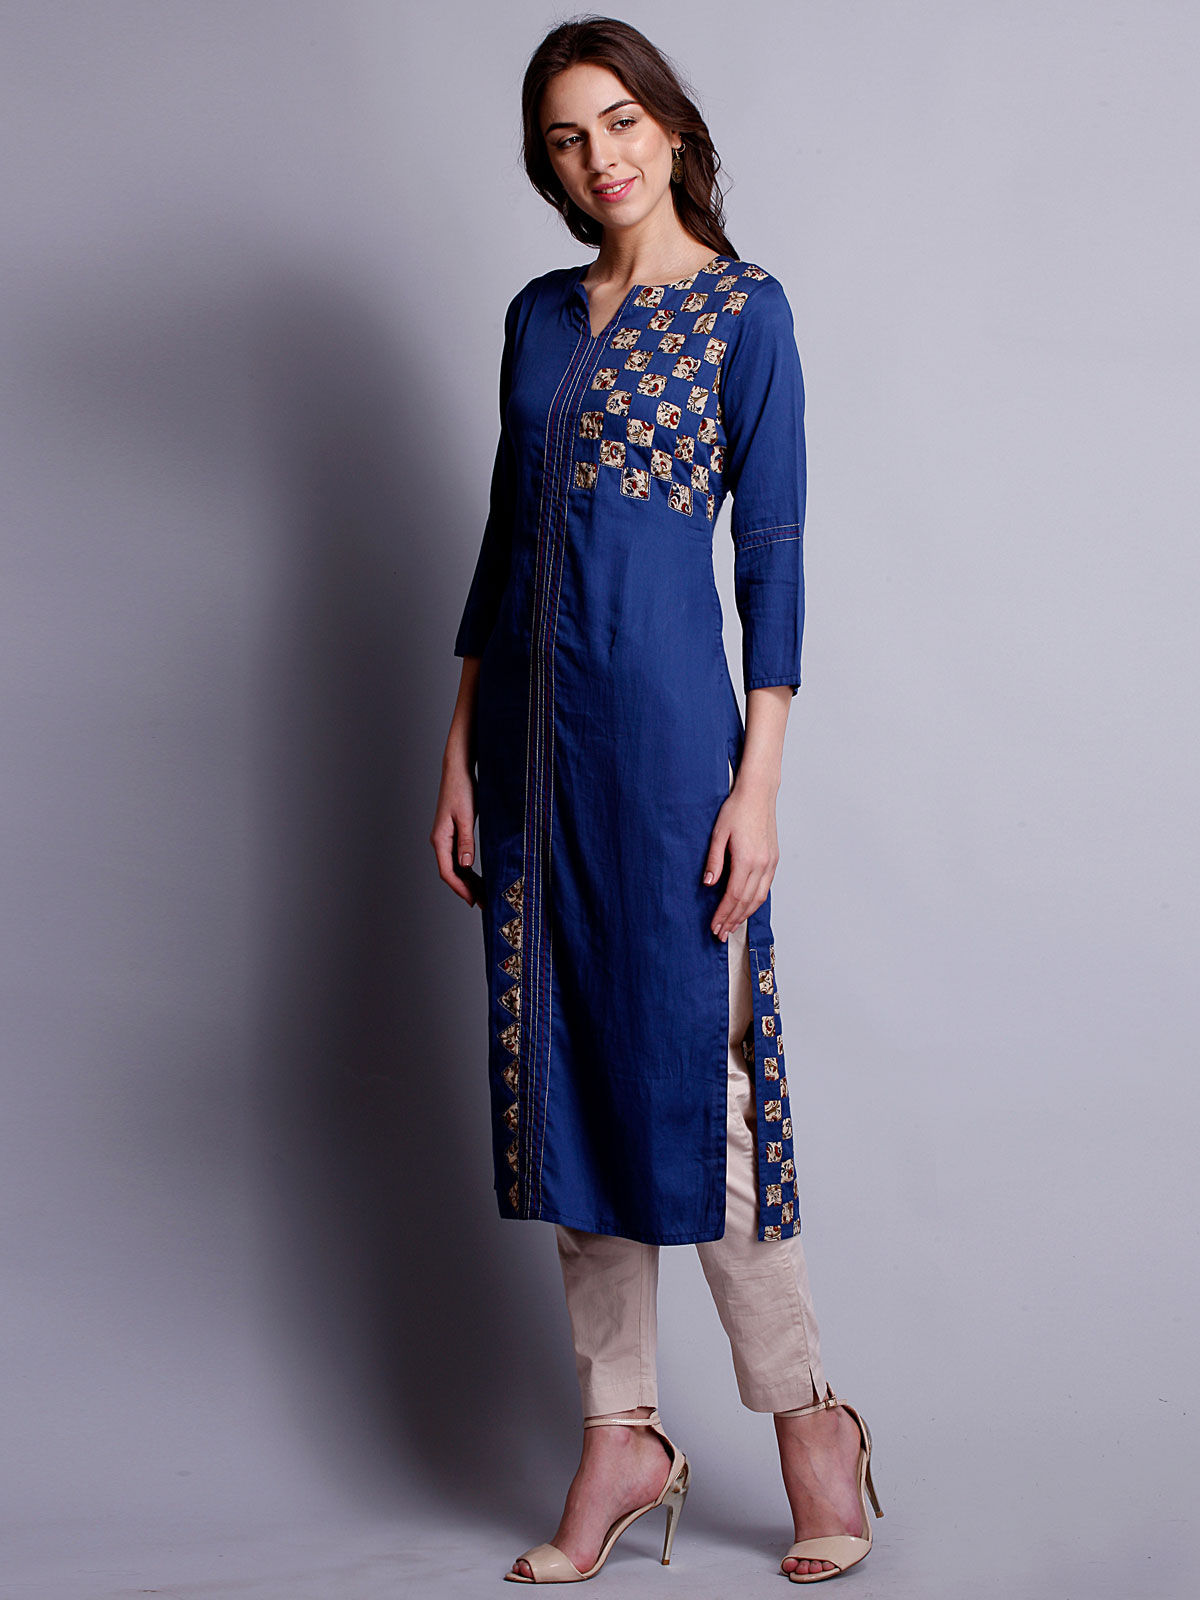 Royal blue reverse applique cotton satin kurta